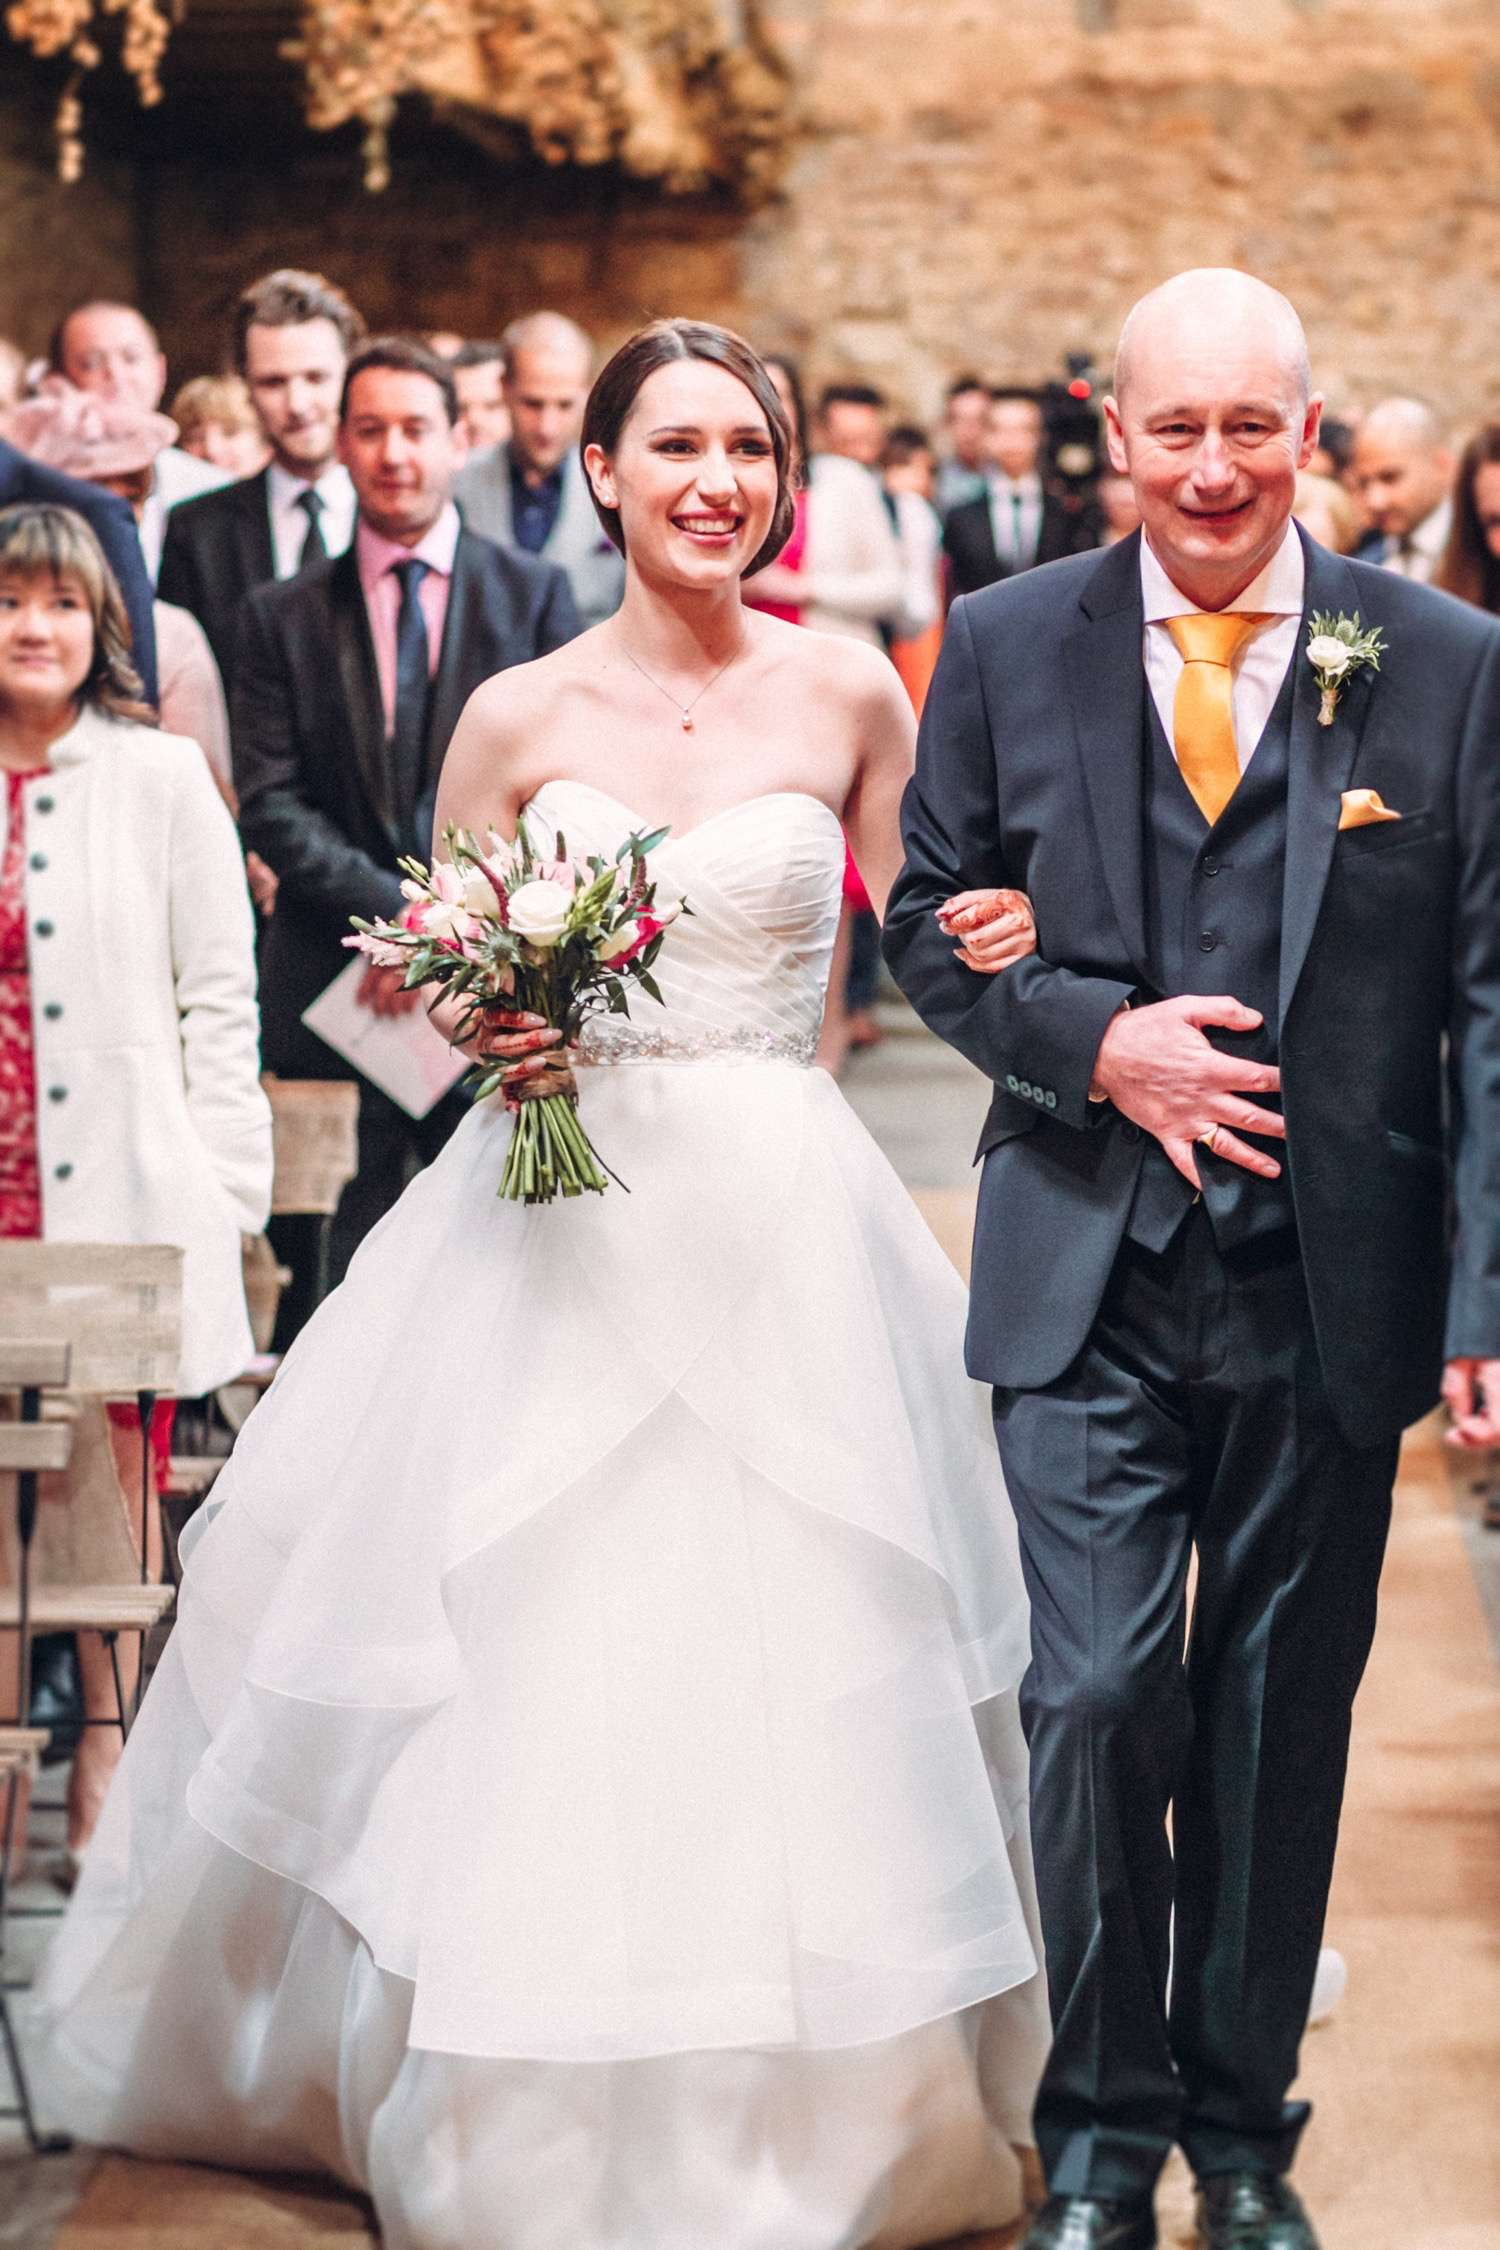 Hindu-Wedding-Photography-Paul-Liddement-Wedding-Stories-39.jpg